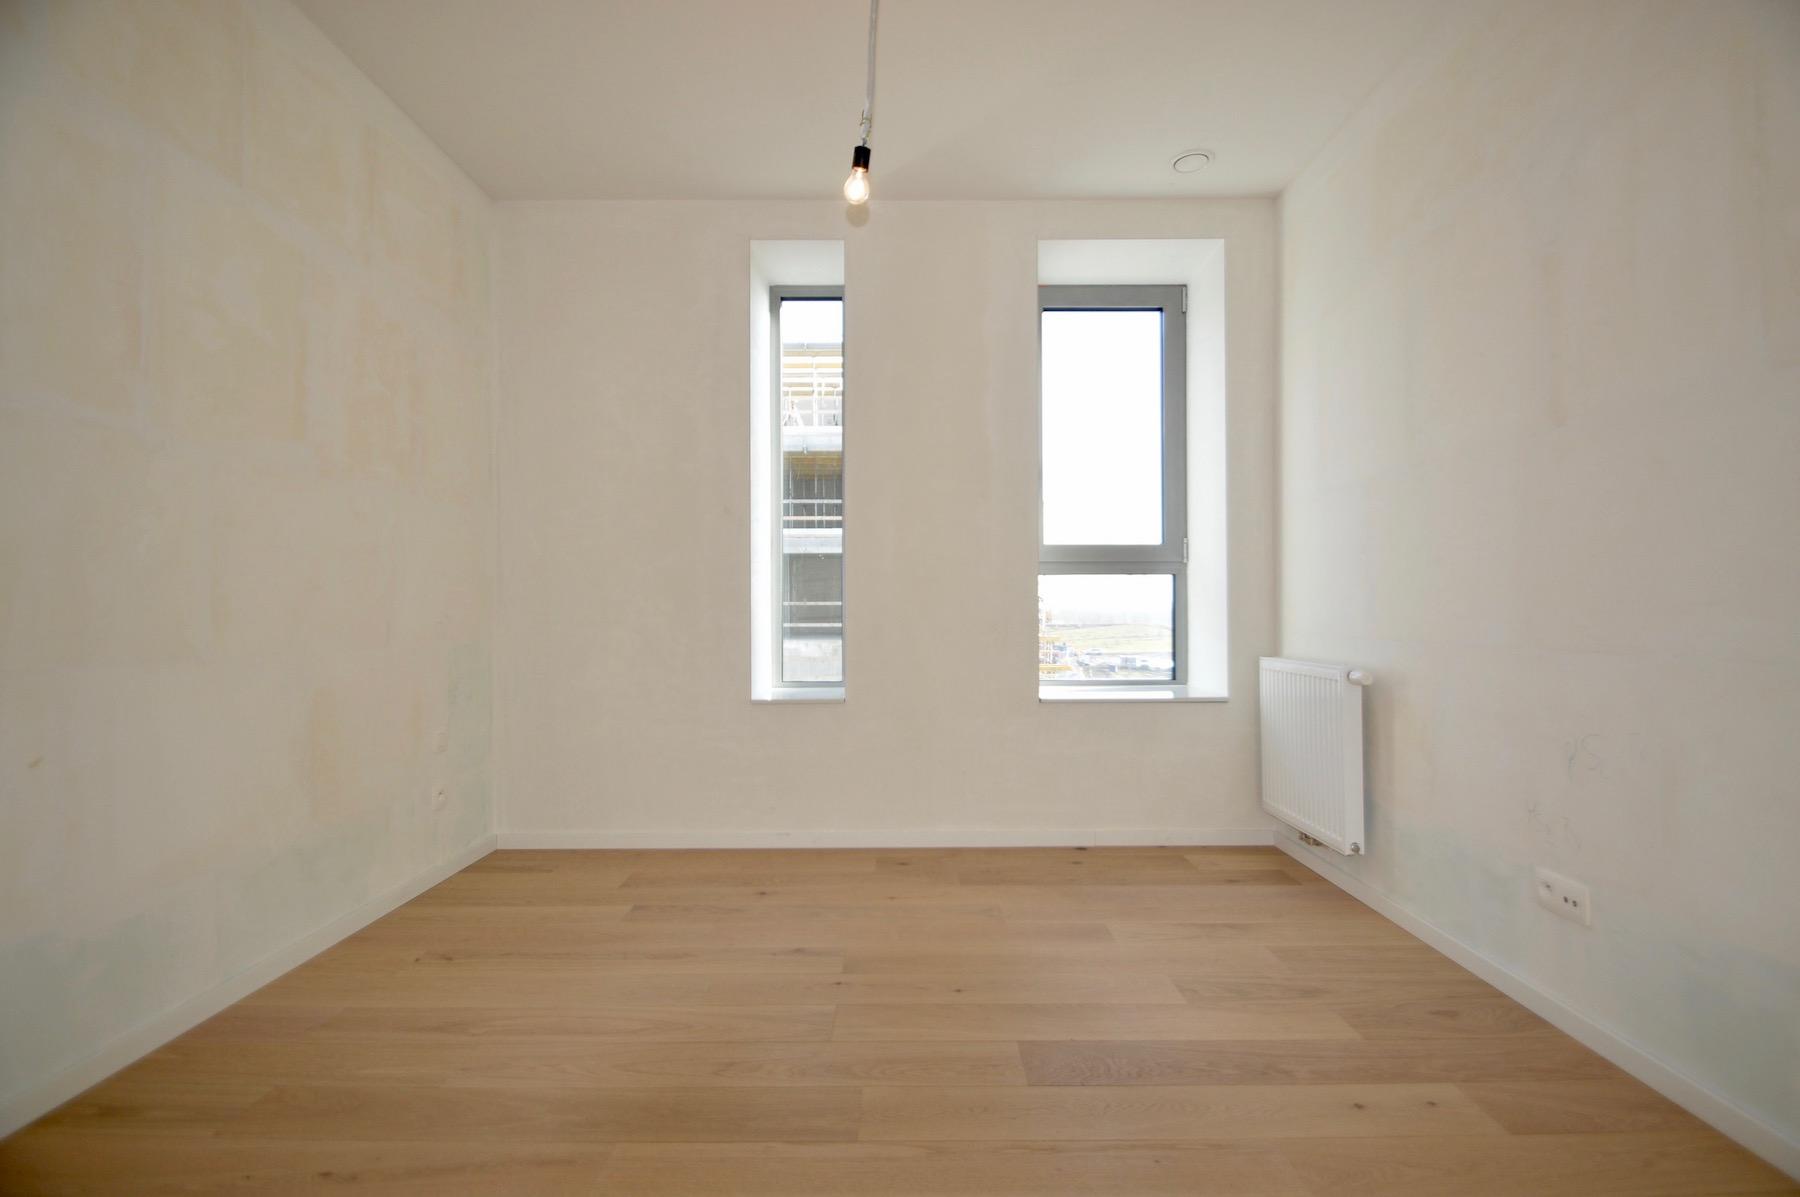 Appartement verkocht te 2000 antwerpen 585000 ka a for Kangoeroewoning te huur antwerpen